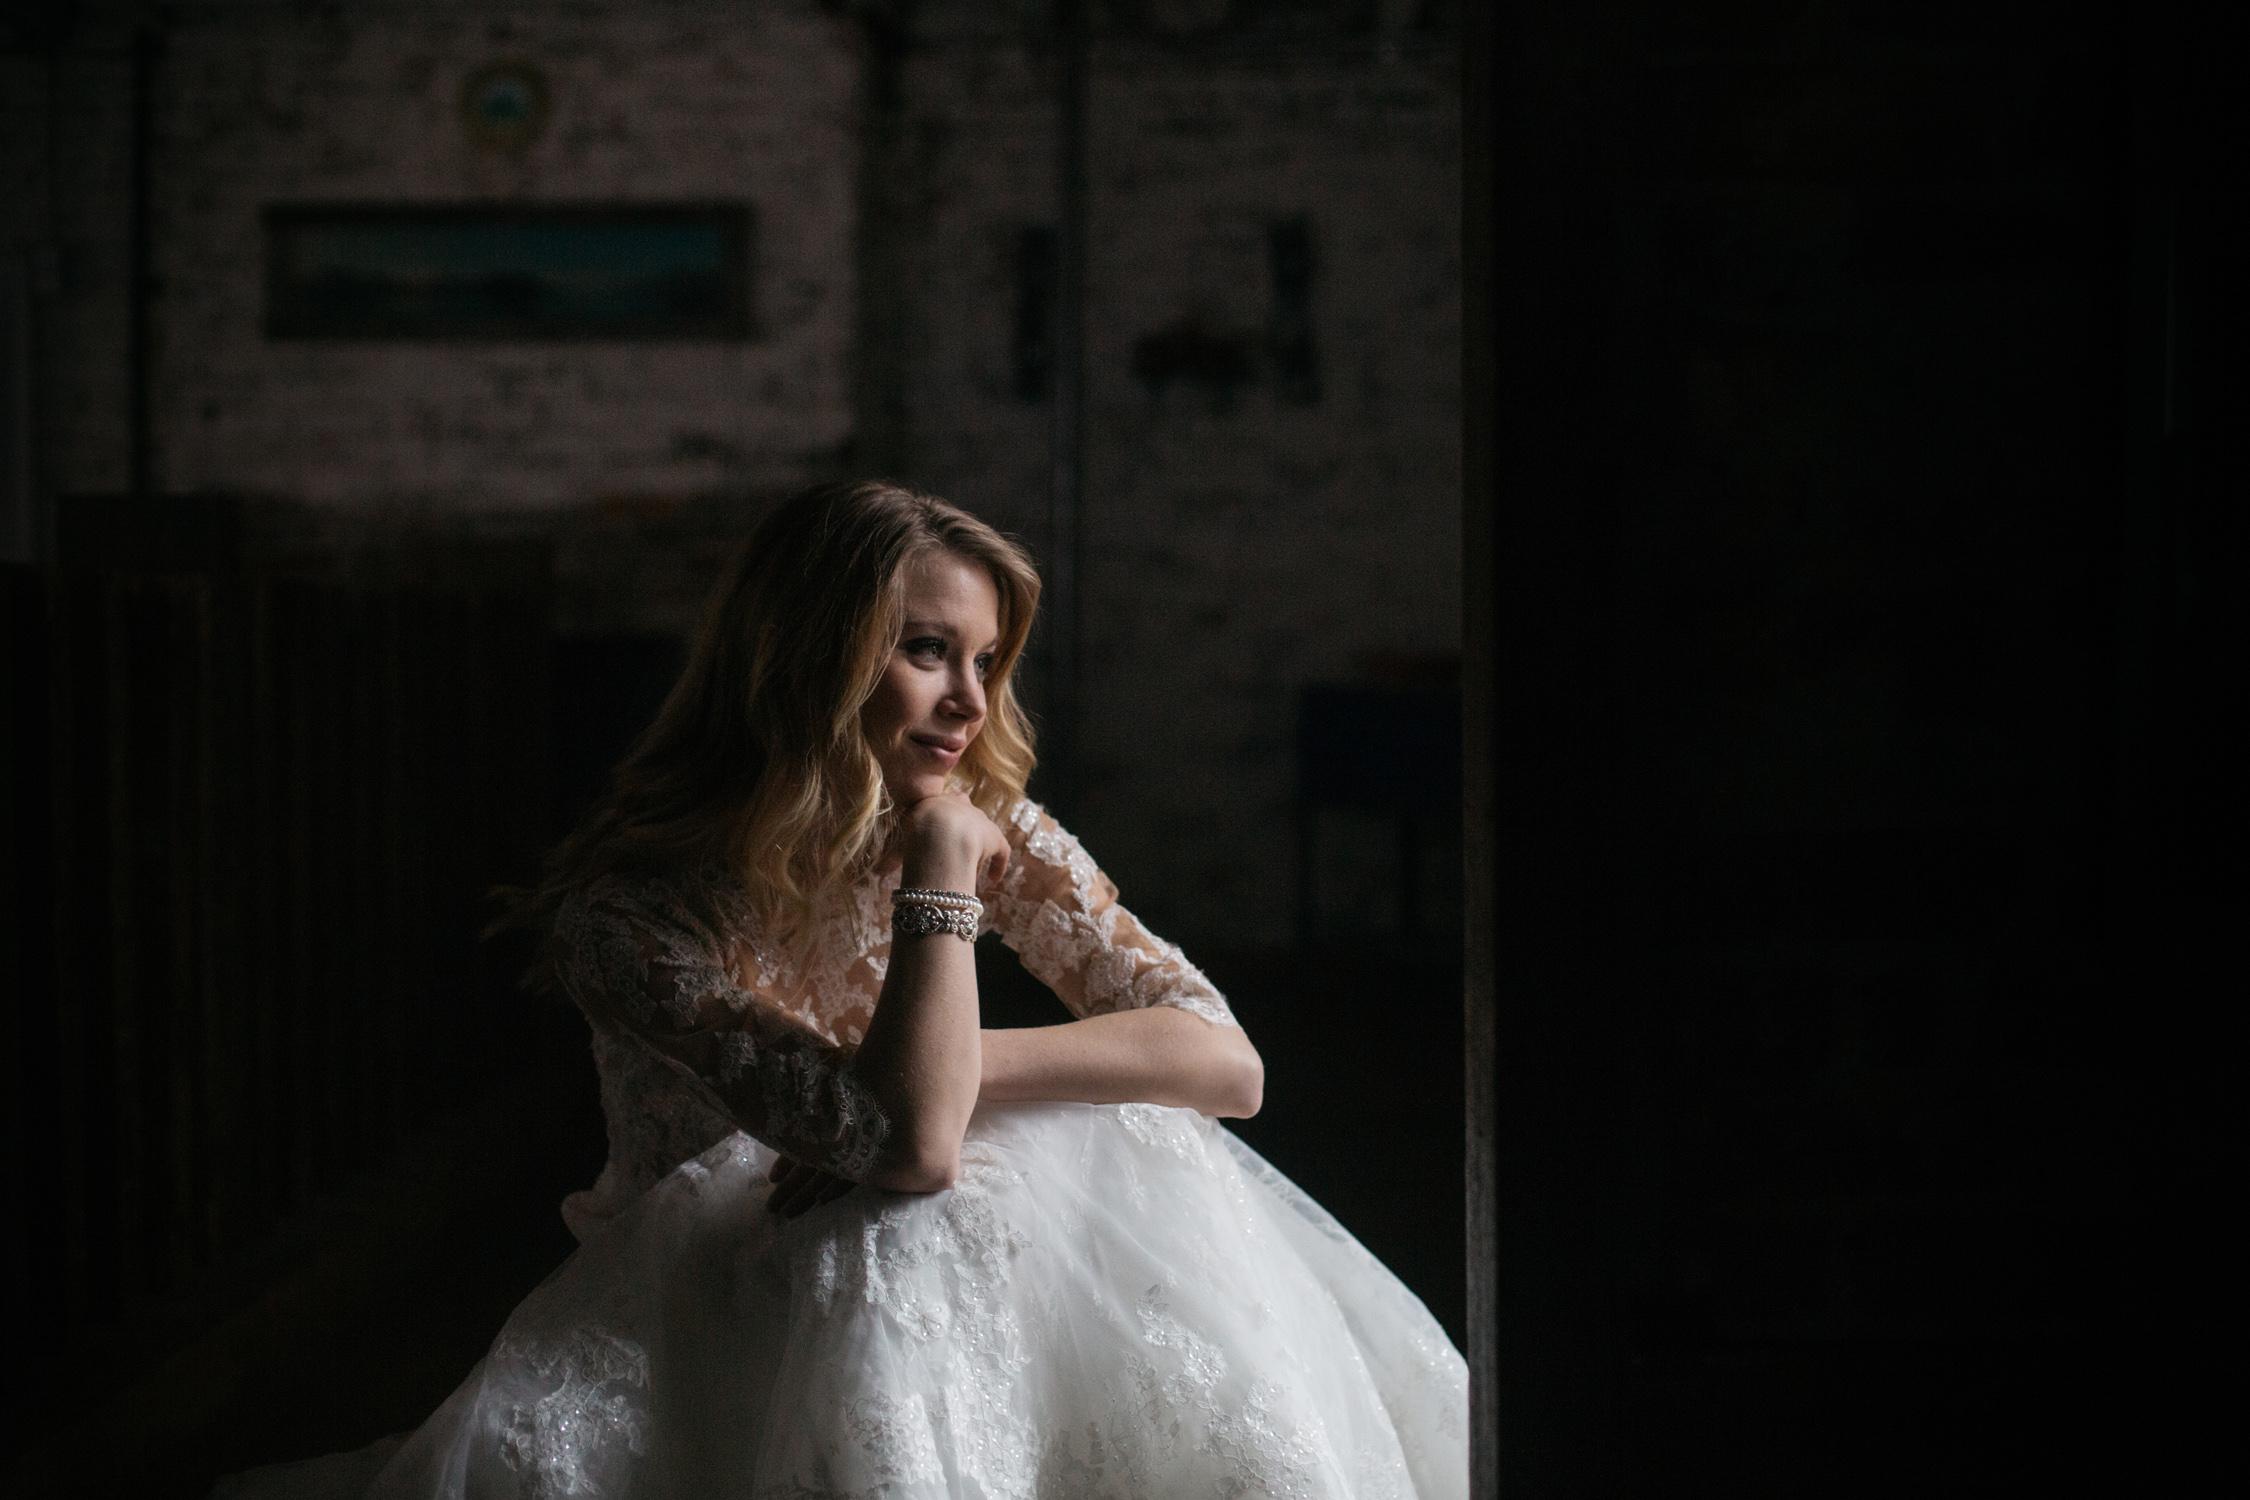 lucas_confectionery_wedding_021.jpg